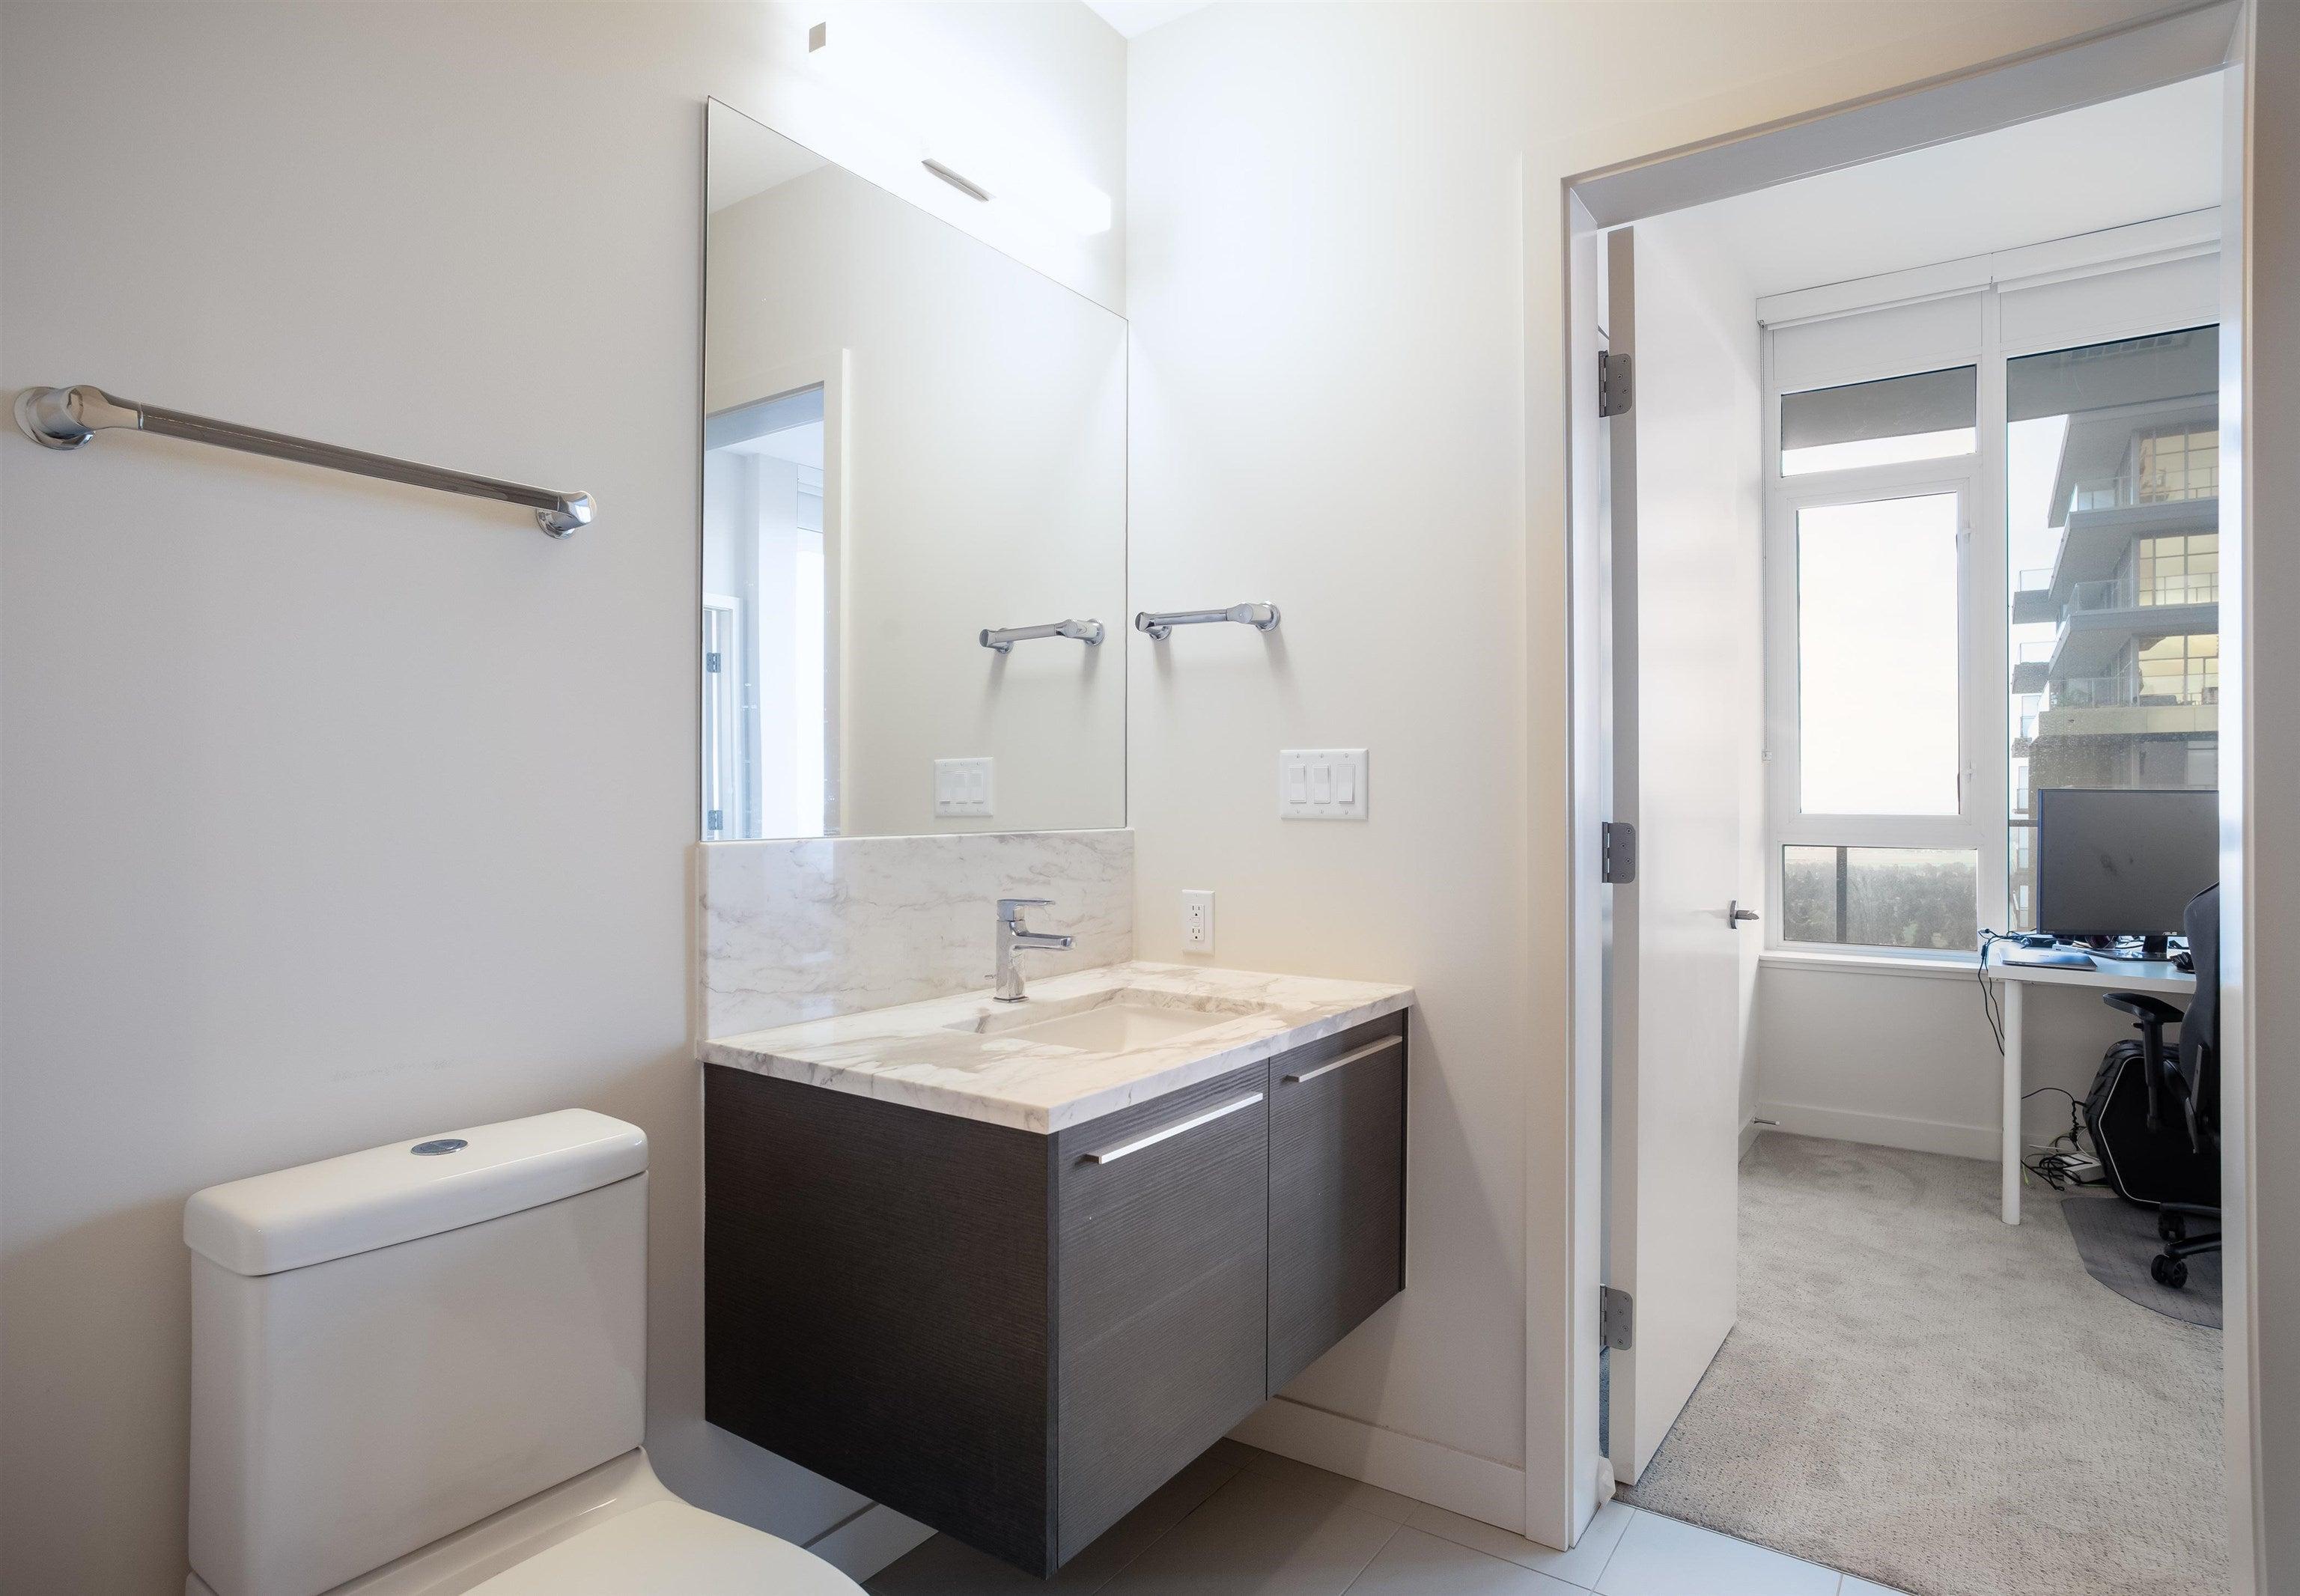 2206 6383 MCKAY AVENUE - Metrotown Apartment/Condo for sale, 2 Bedrooms (R2625647) - #18